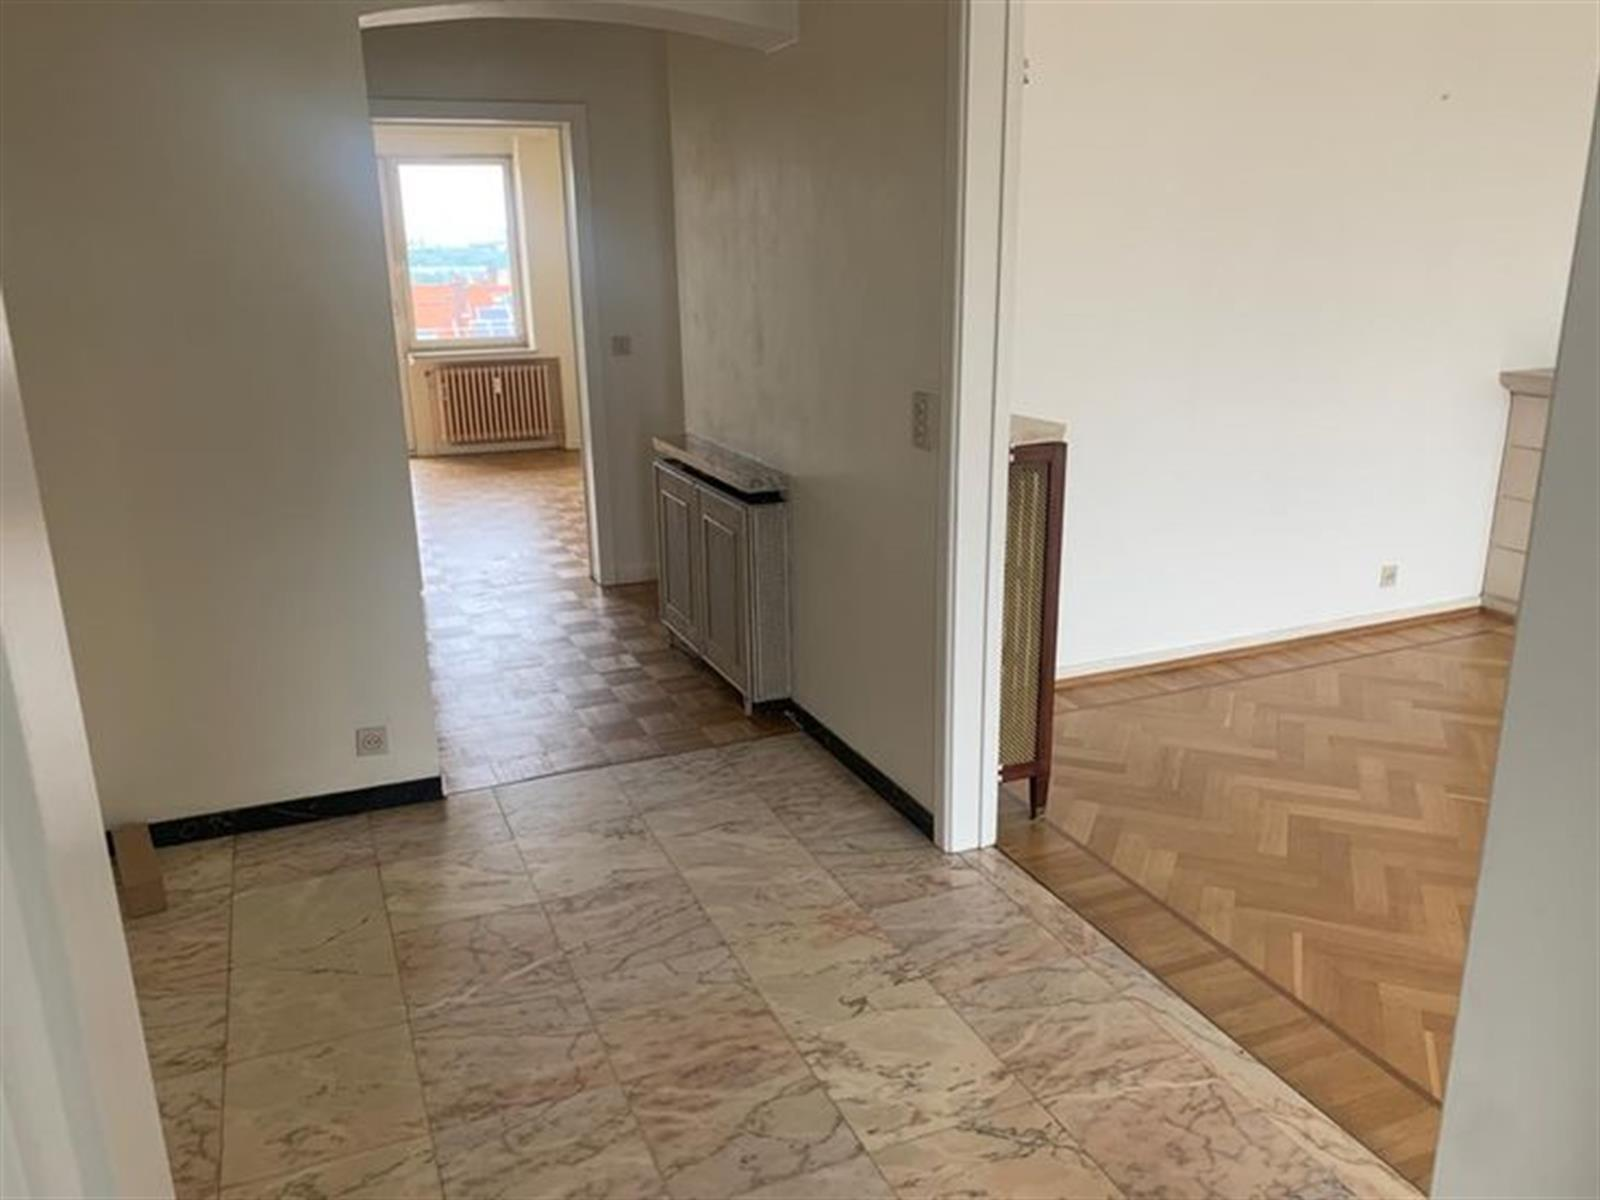 Appartement - Woluwe-Saint-Lambert - #4399349-4